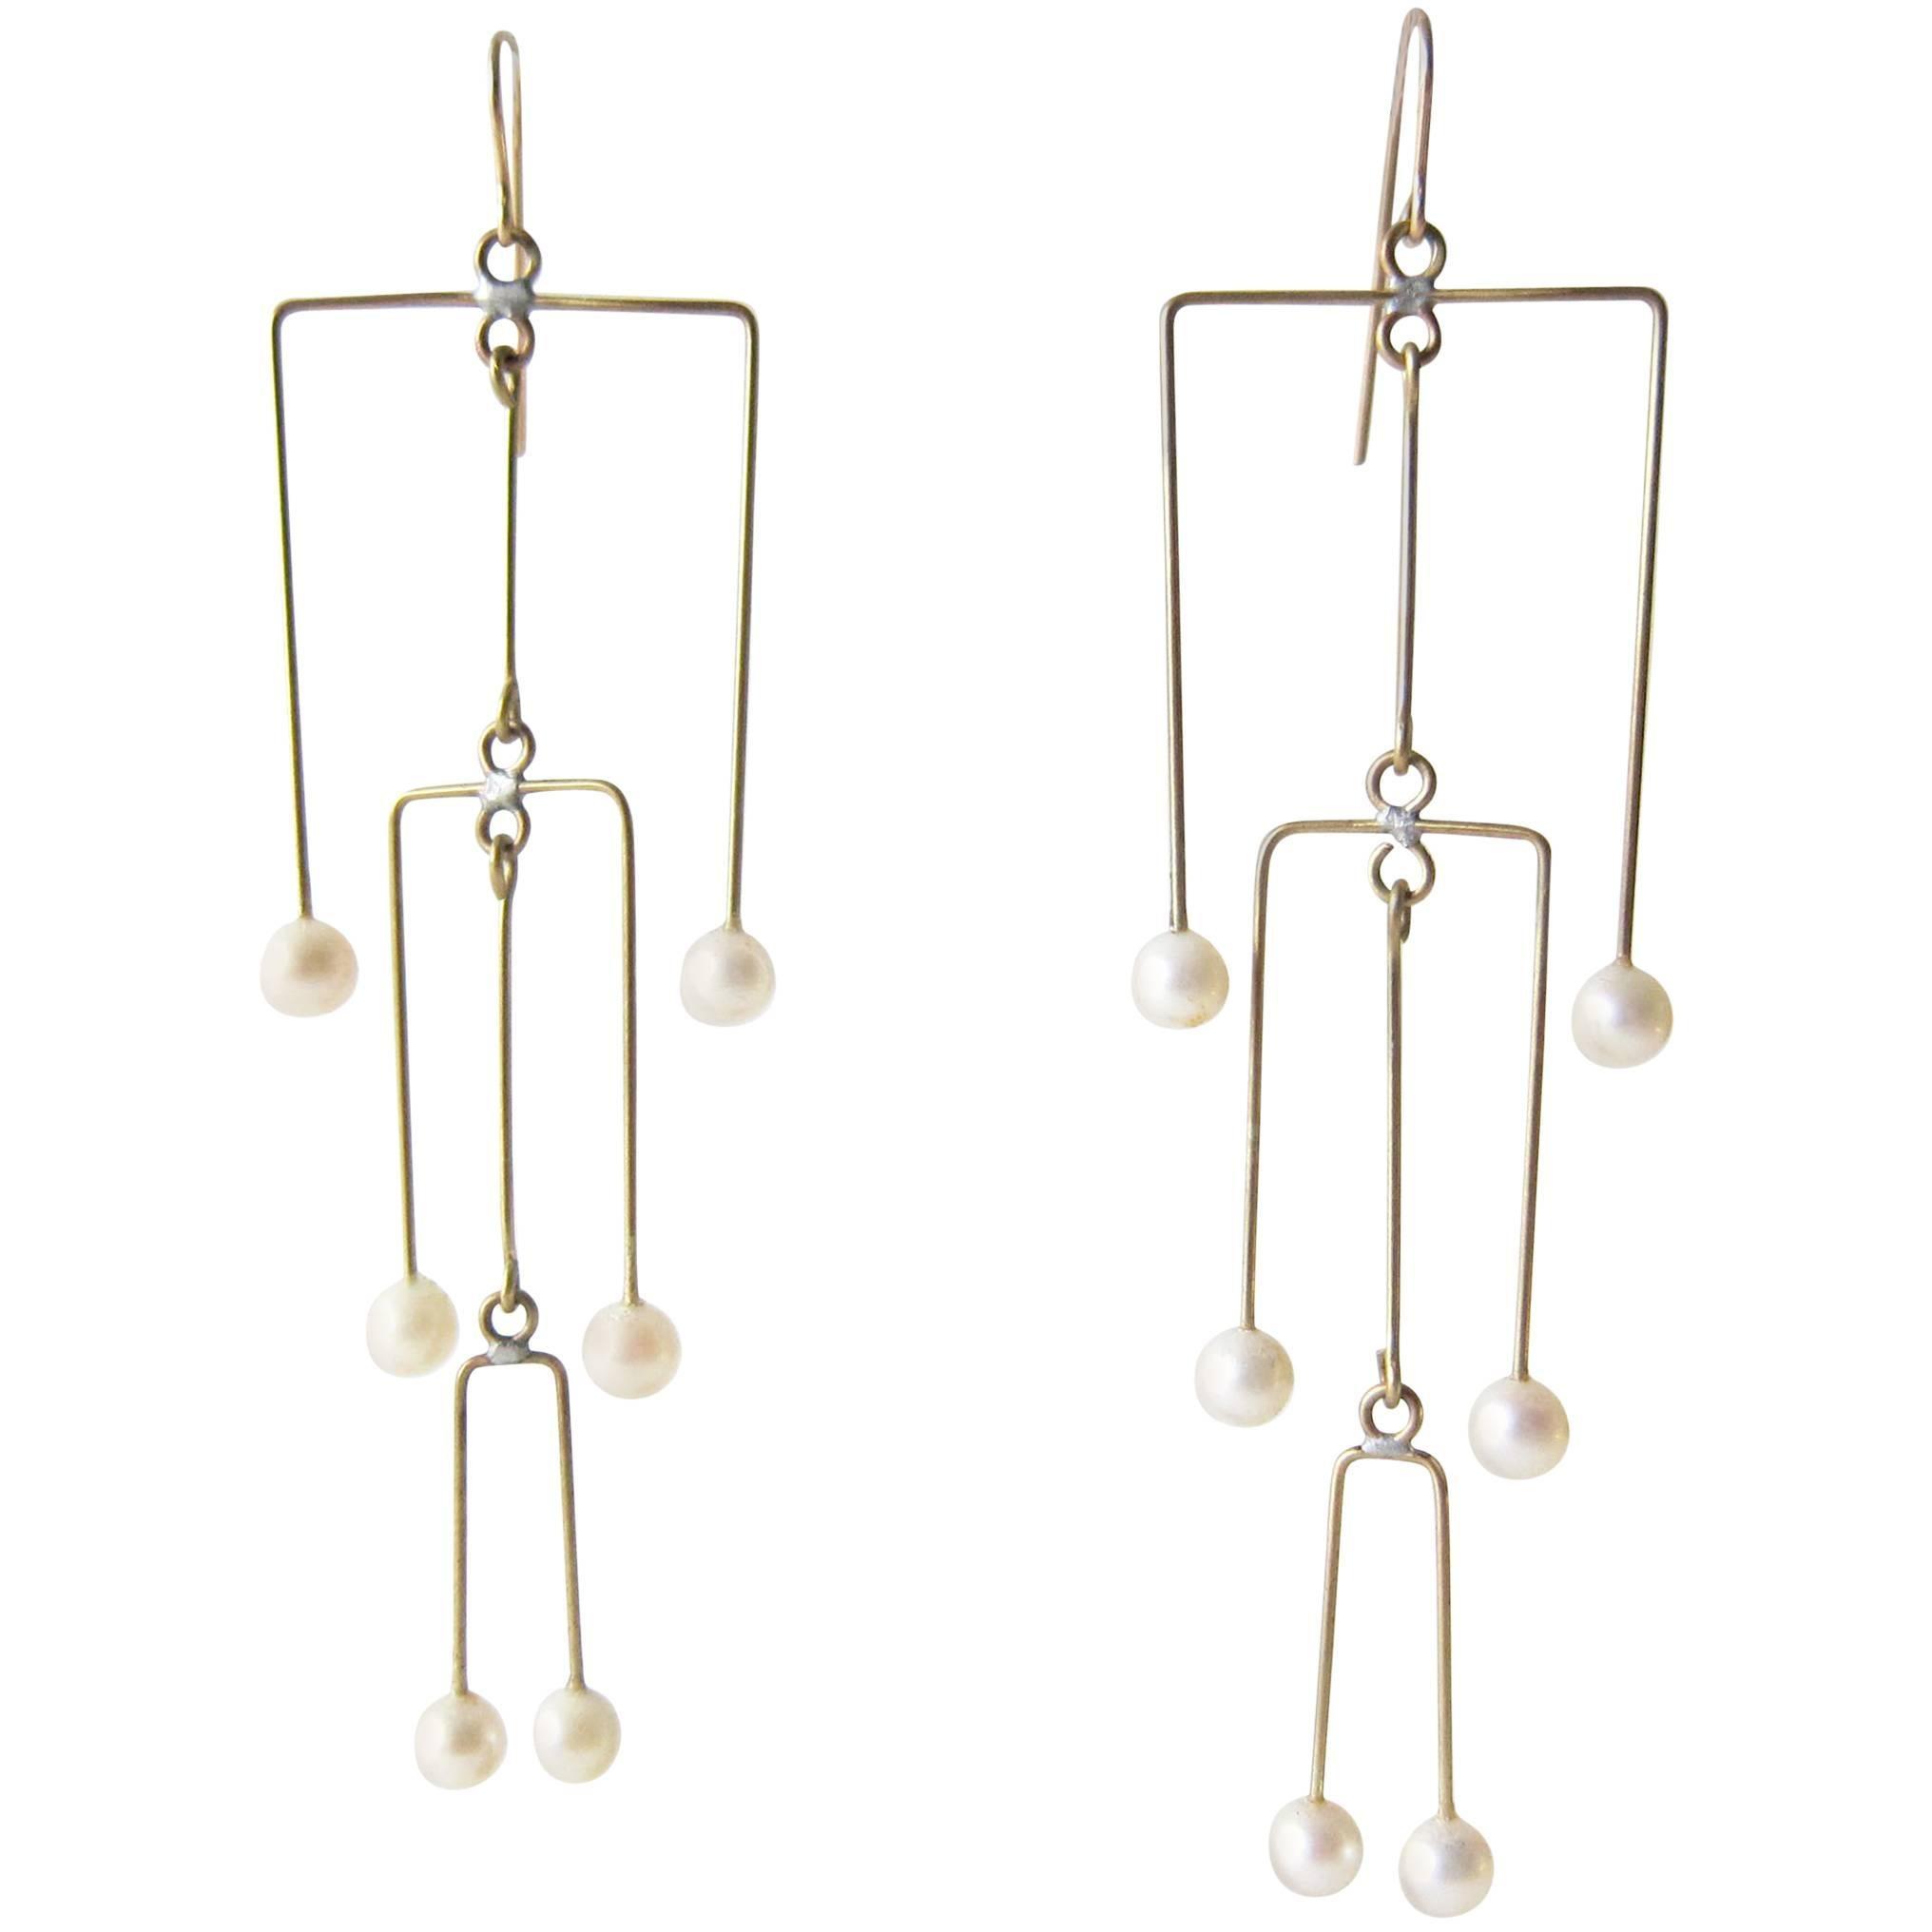 Heidi Abrahamson Pearl Brass Kinetic Mobile Earrings